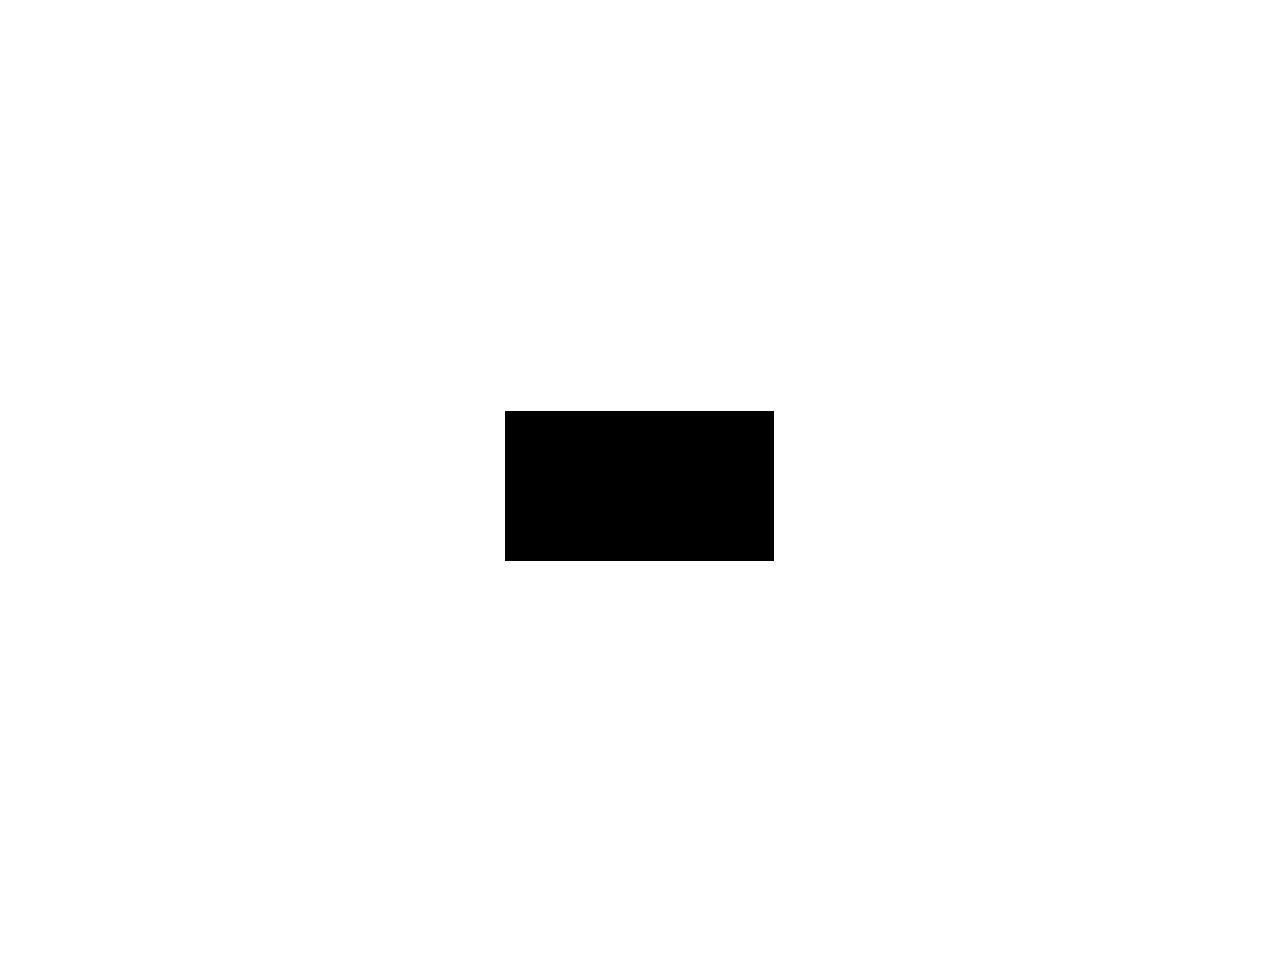 crft_black_square